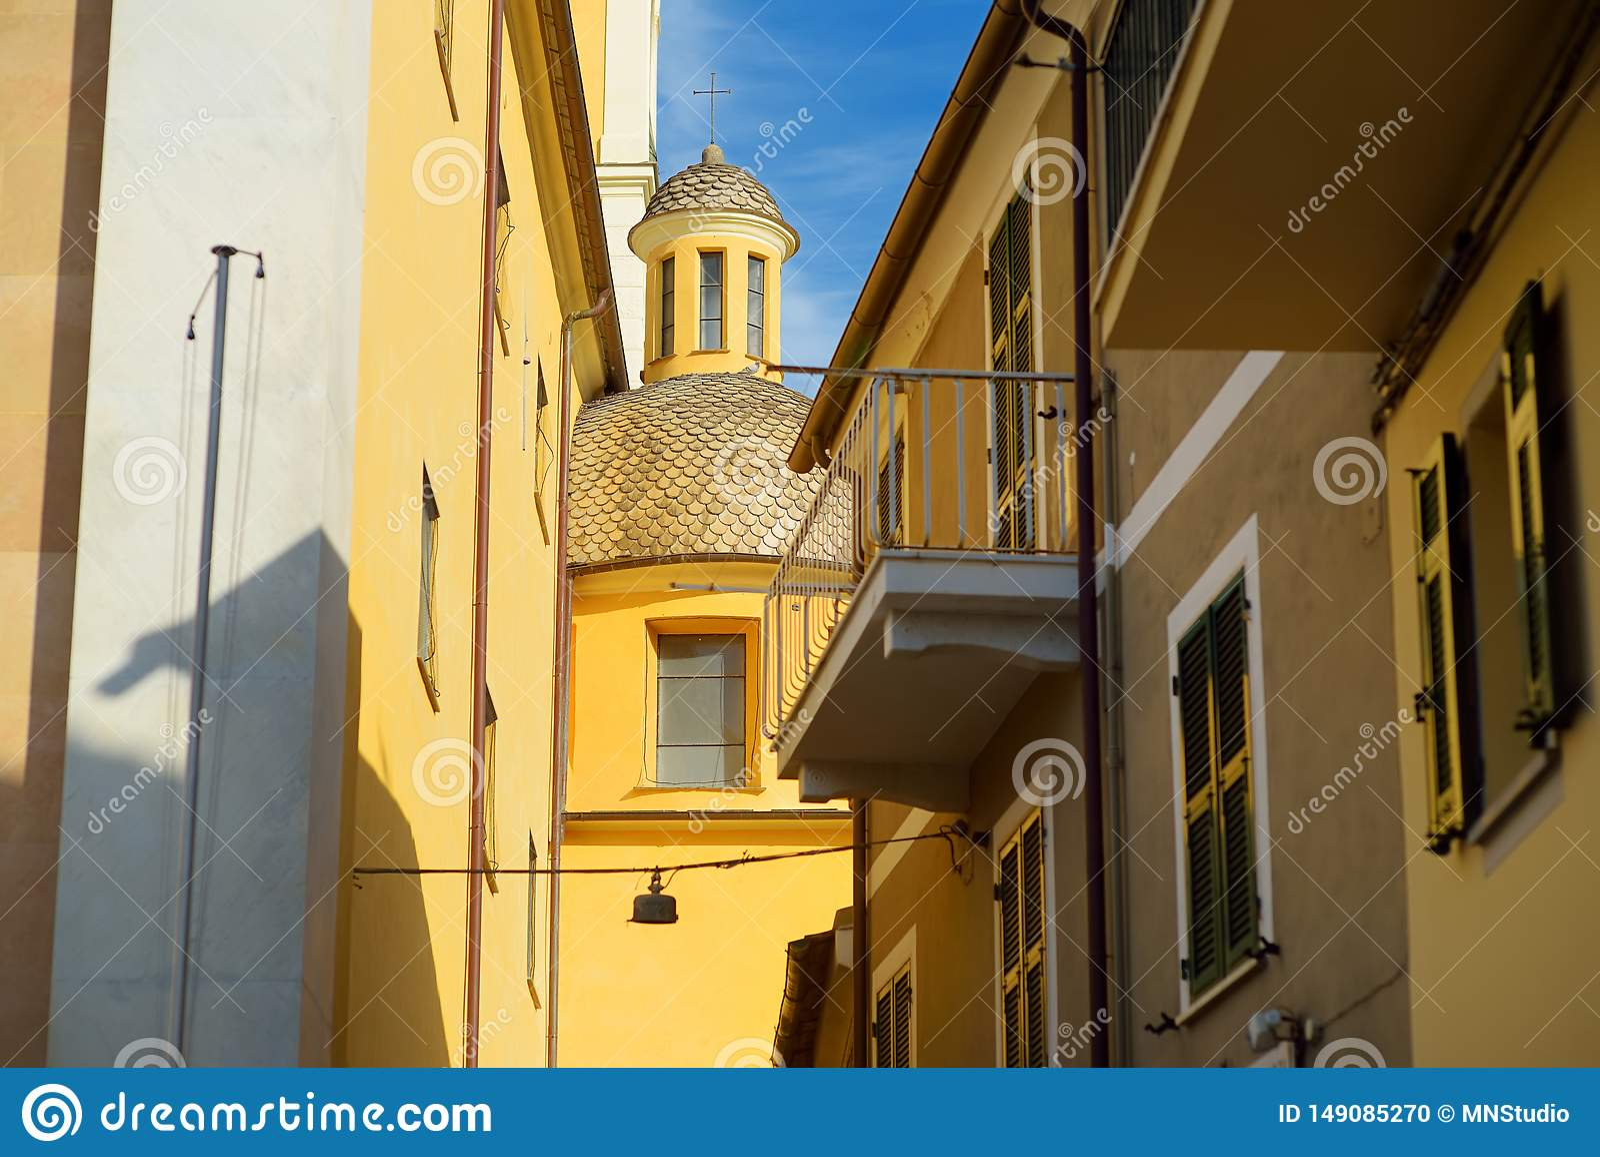 F?rgrika hus av den Lerici staden som lokaliseras i landskapet av La Spezia i Liguria, del av italienaren Riviera